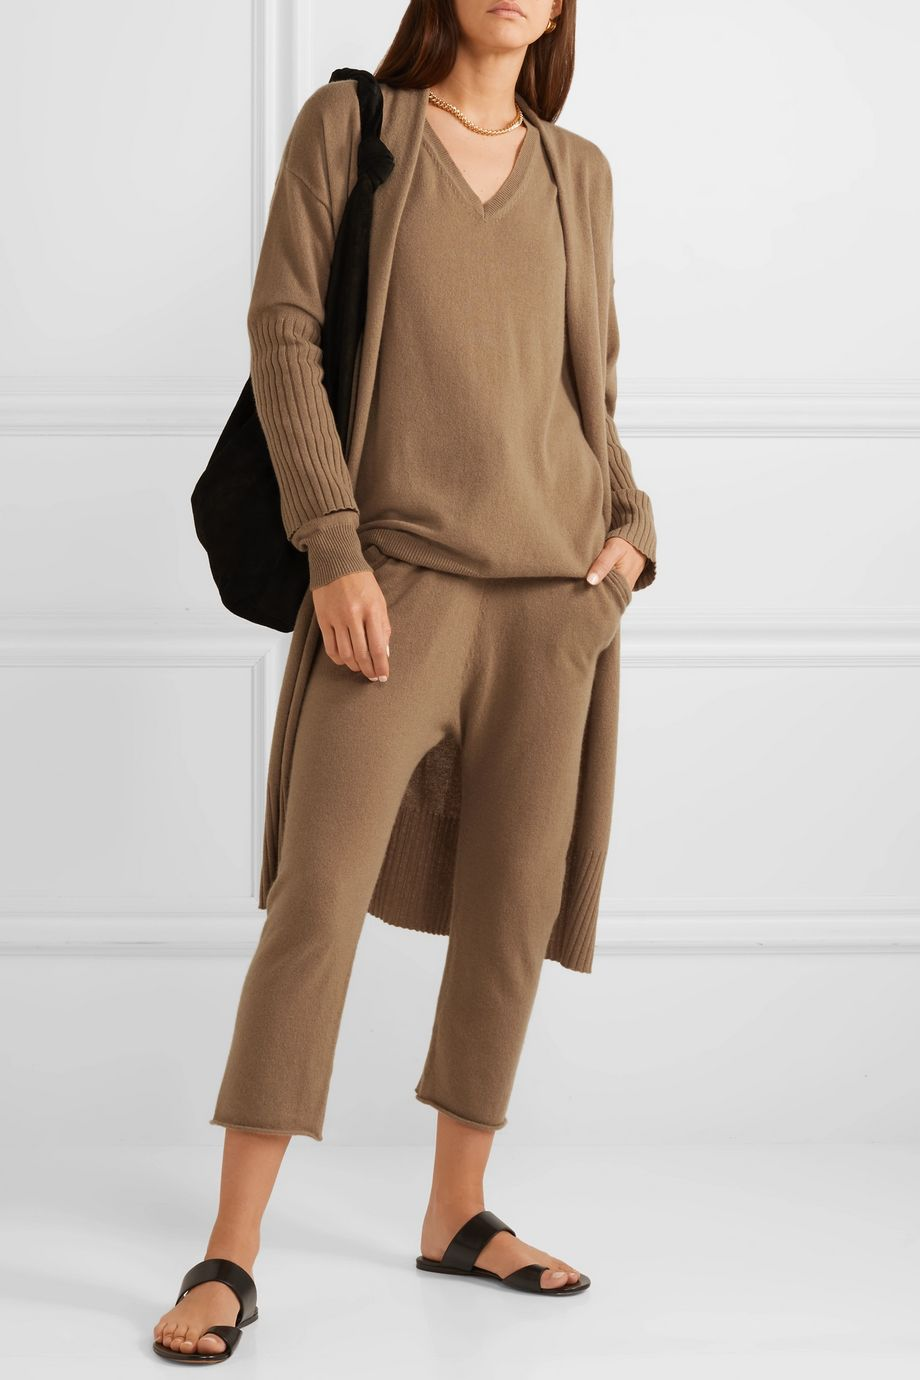 Nili Lotan Kendra cashmere sweater